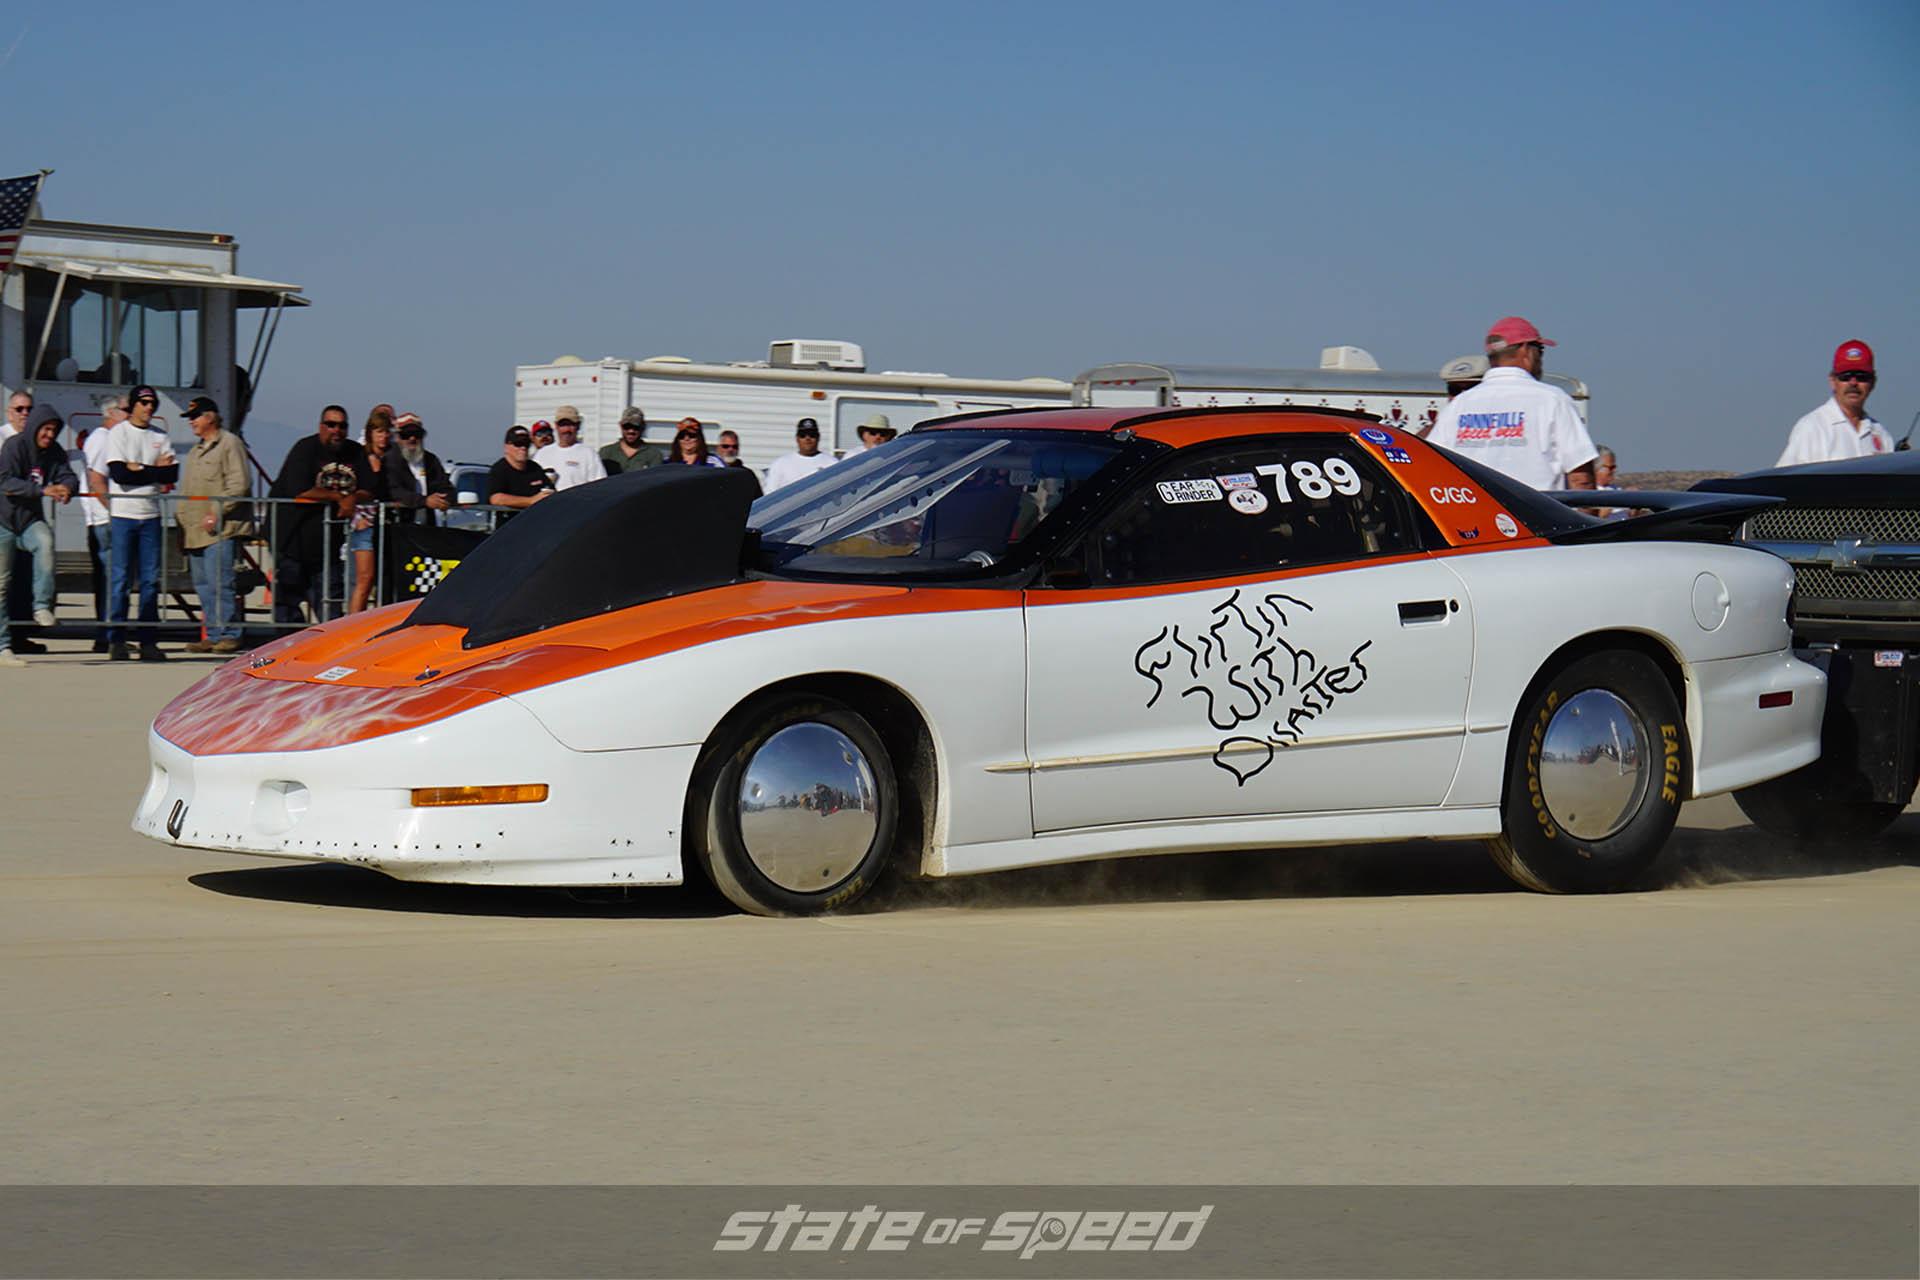 Gen IV drag car